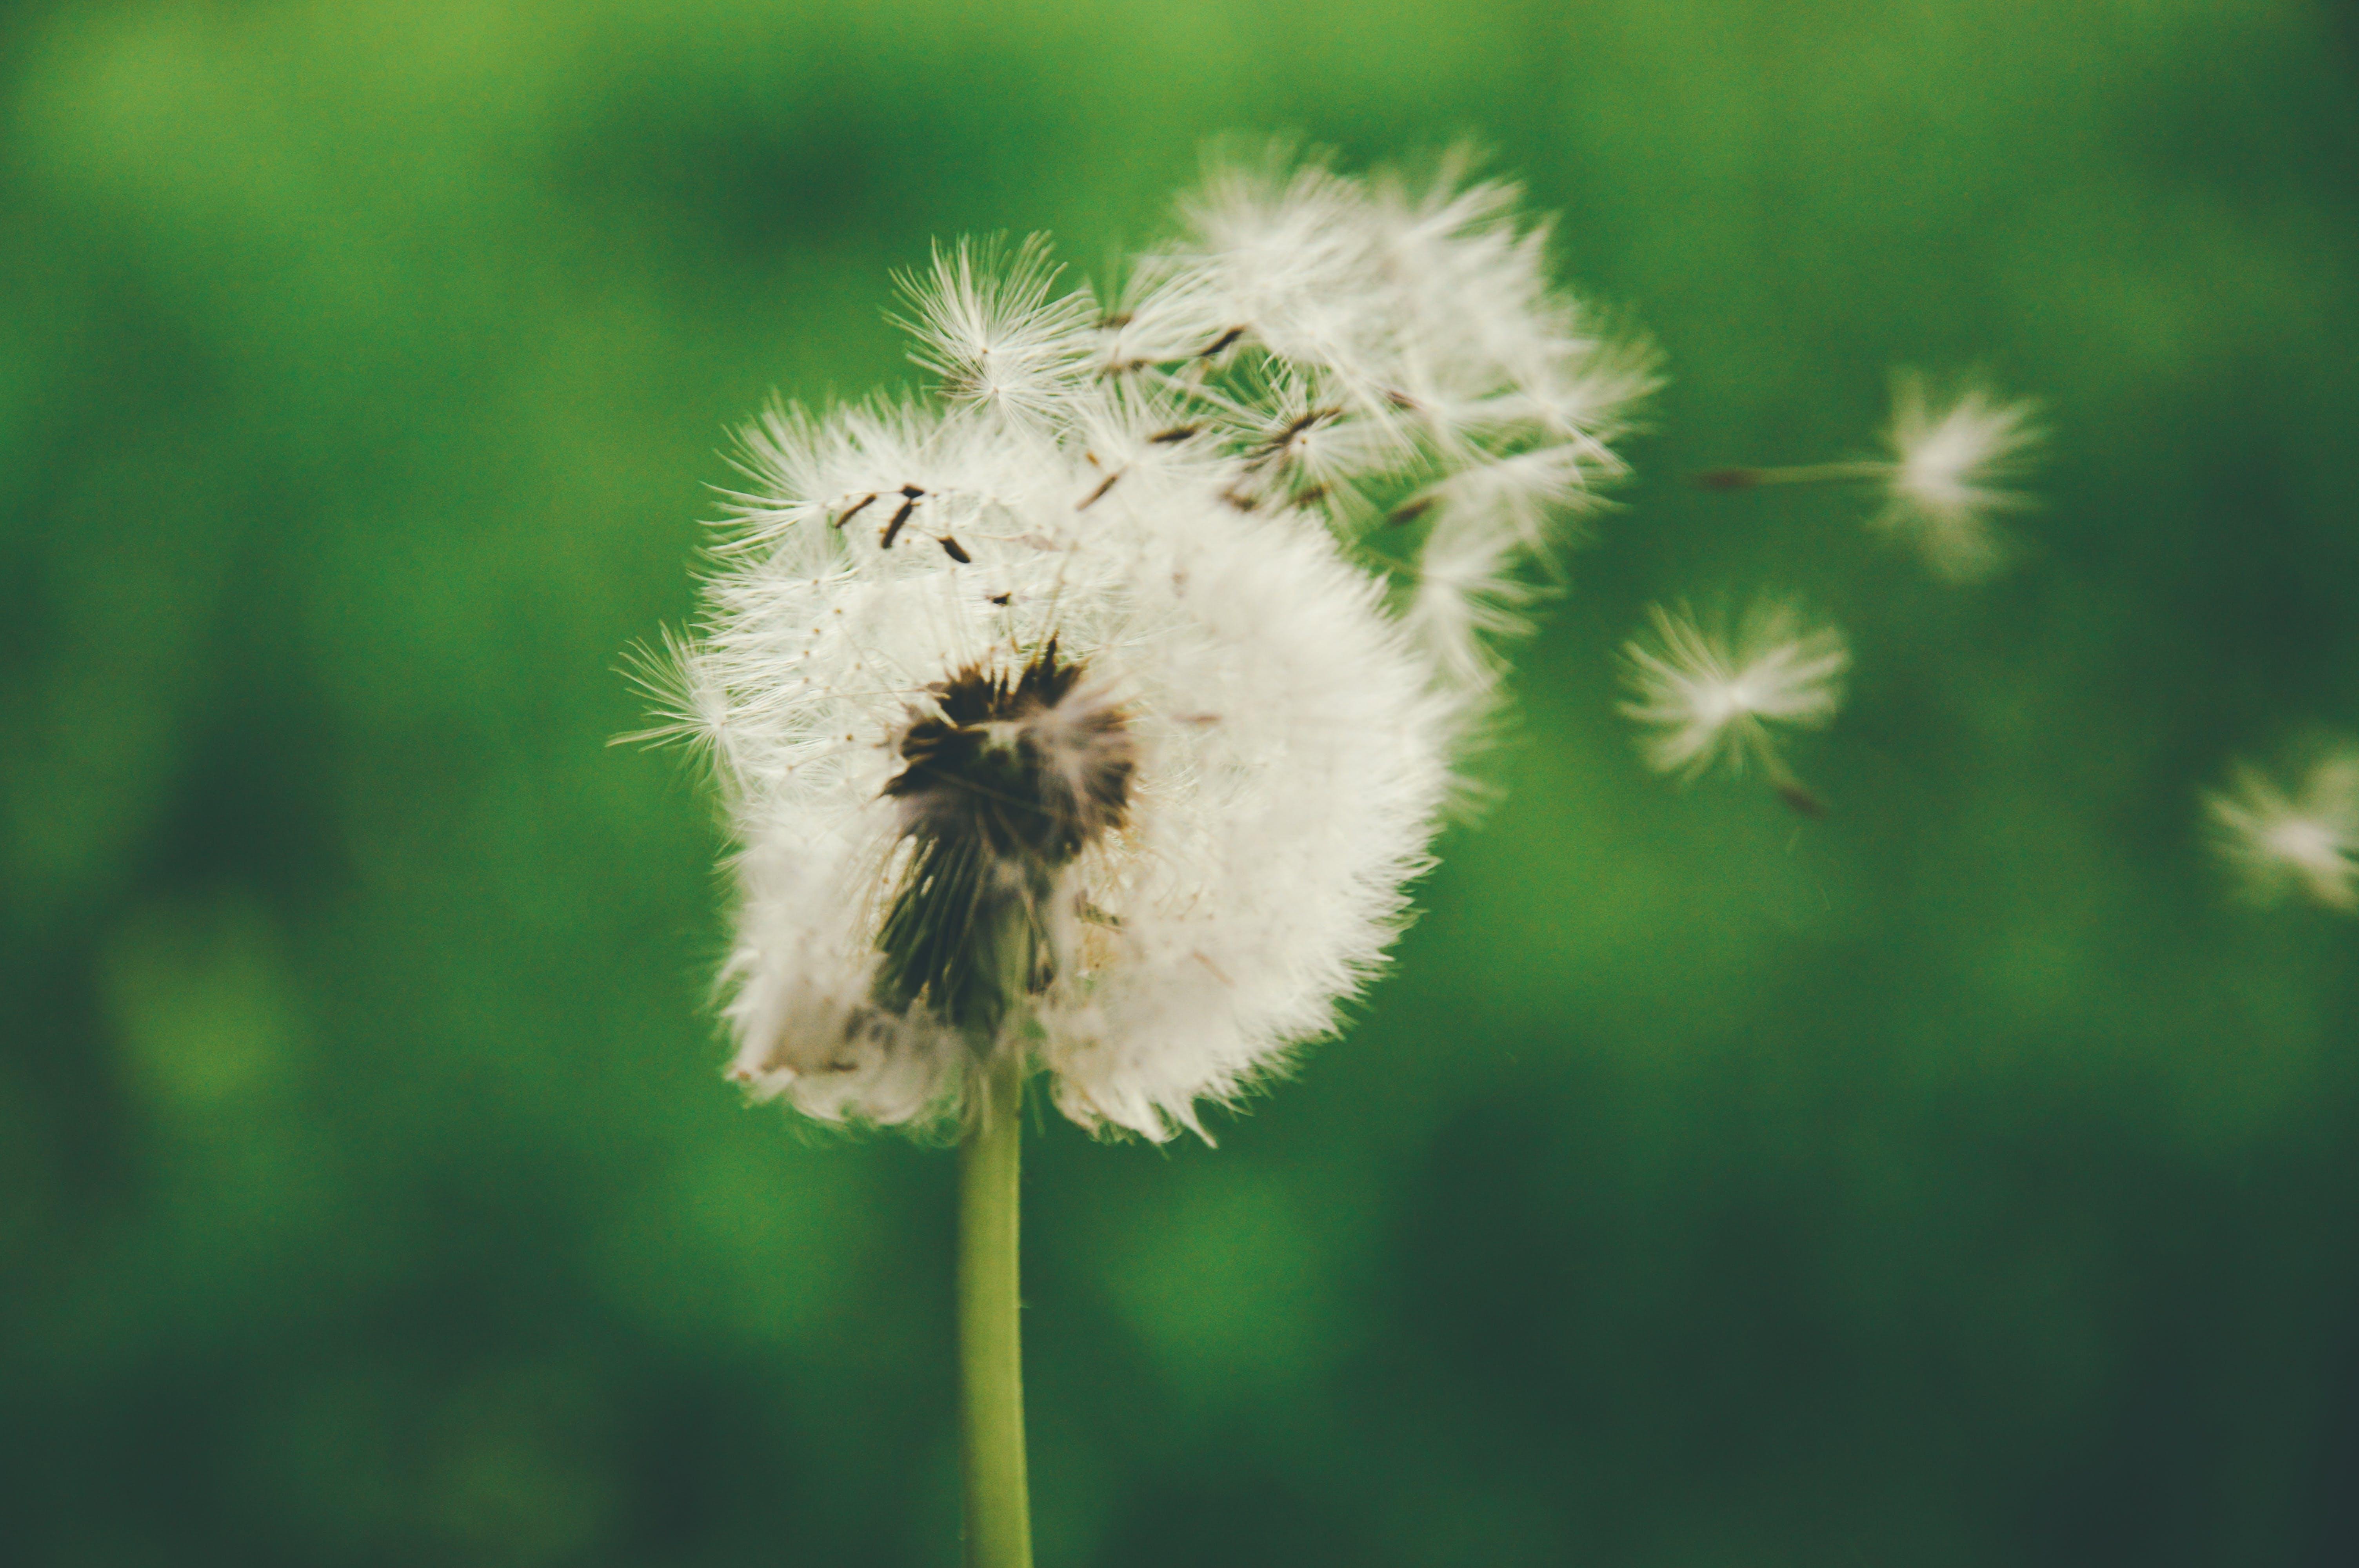 Free stock photo of dandelion, puffball